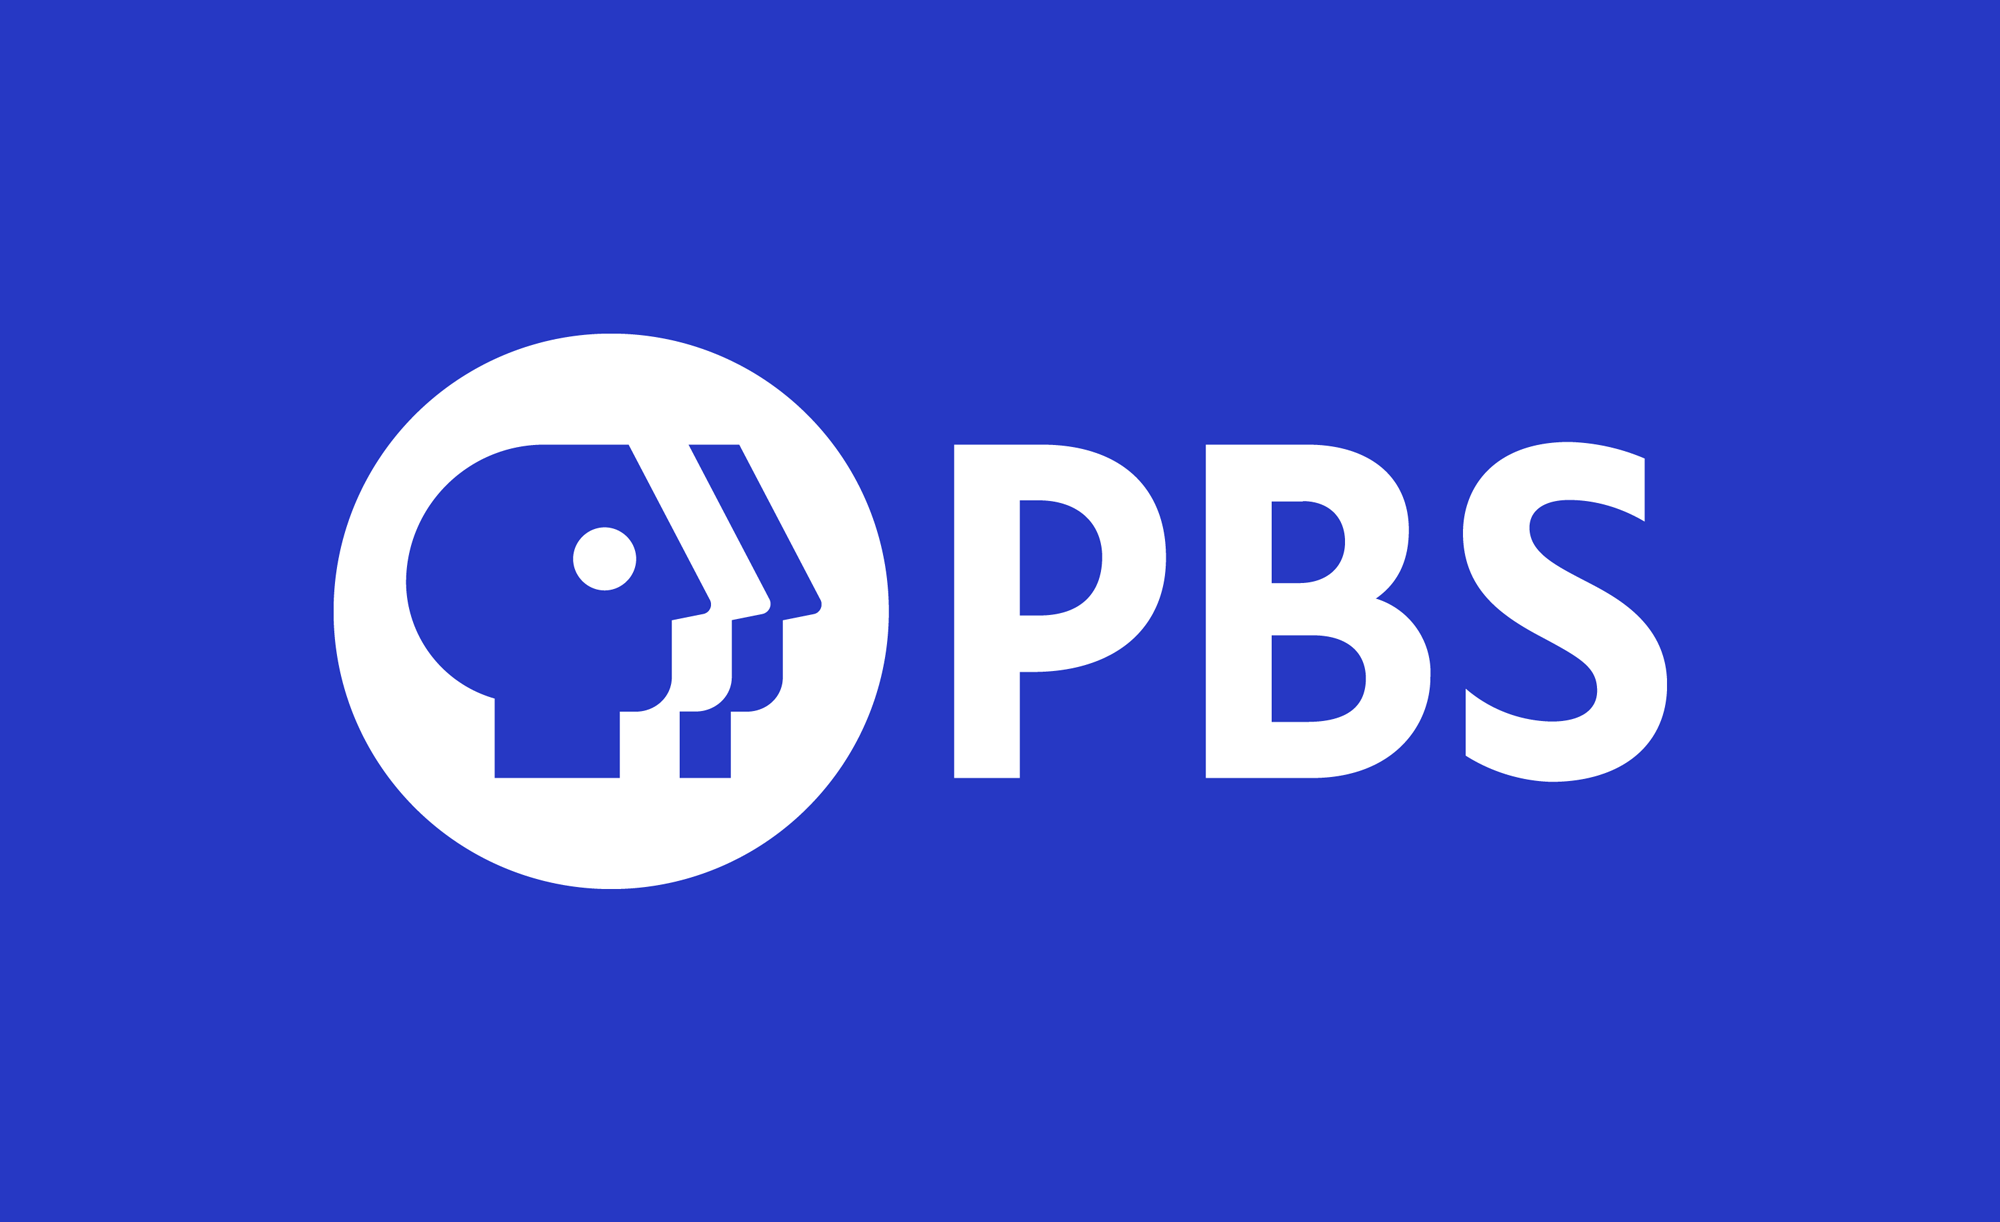 https://sensibleshoes.tv/wp-content/uploads/2020/06/pbs_2019_logo.png